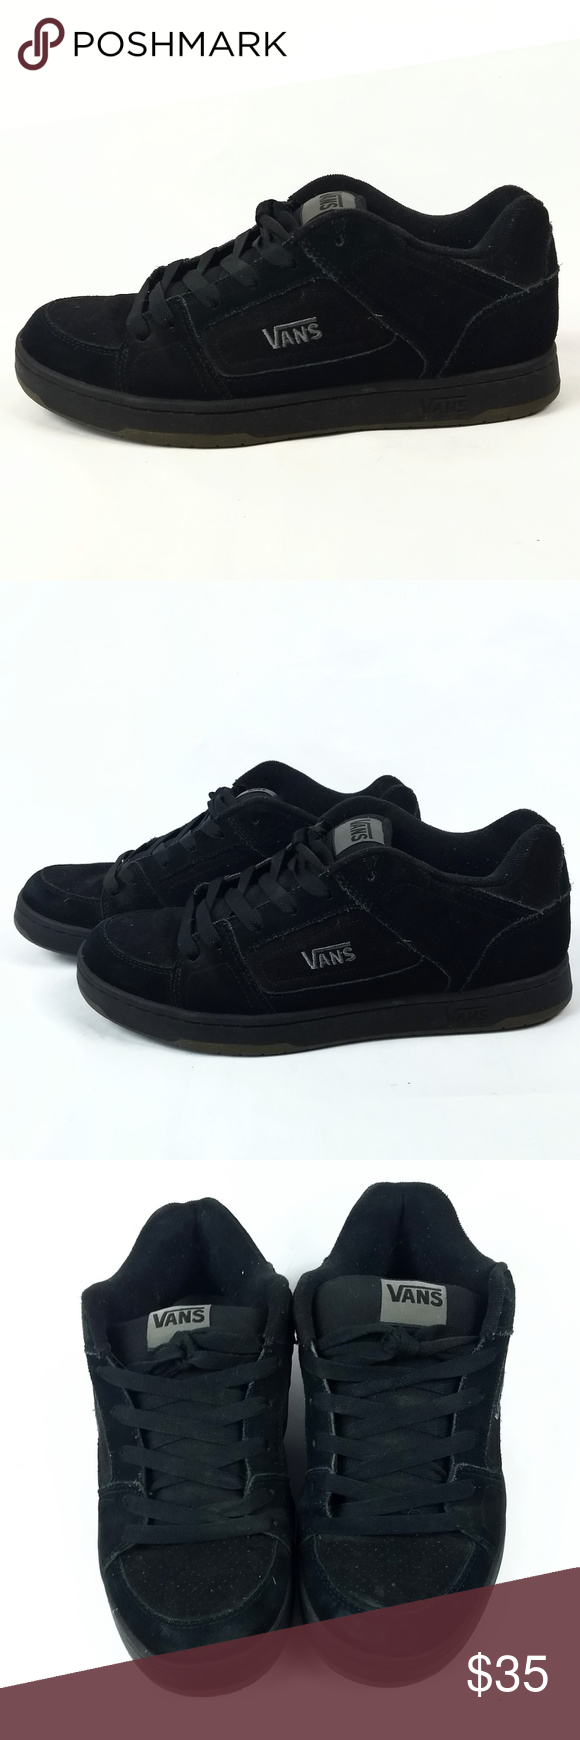 Vans Docket Skate Black Suede Flat